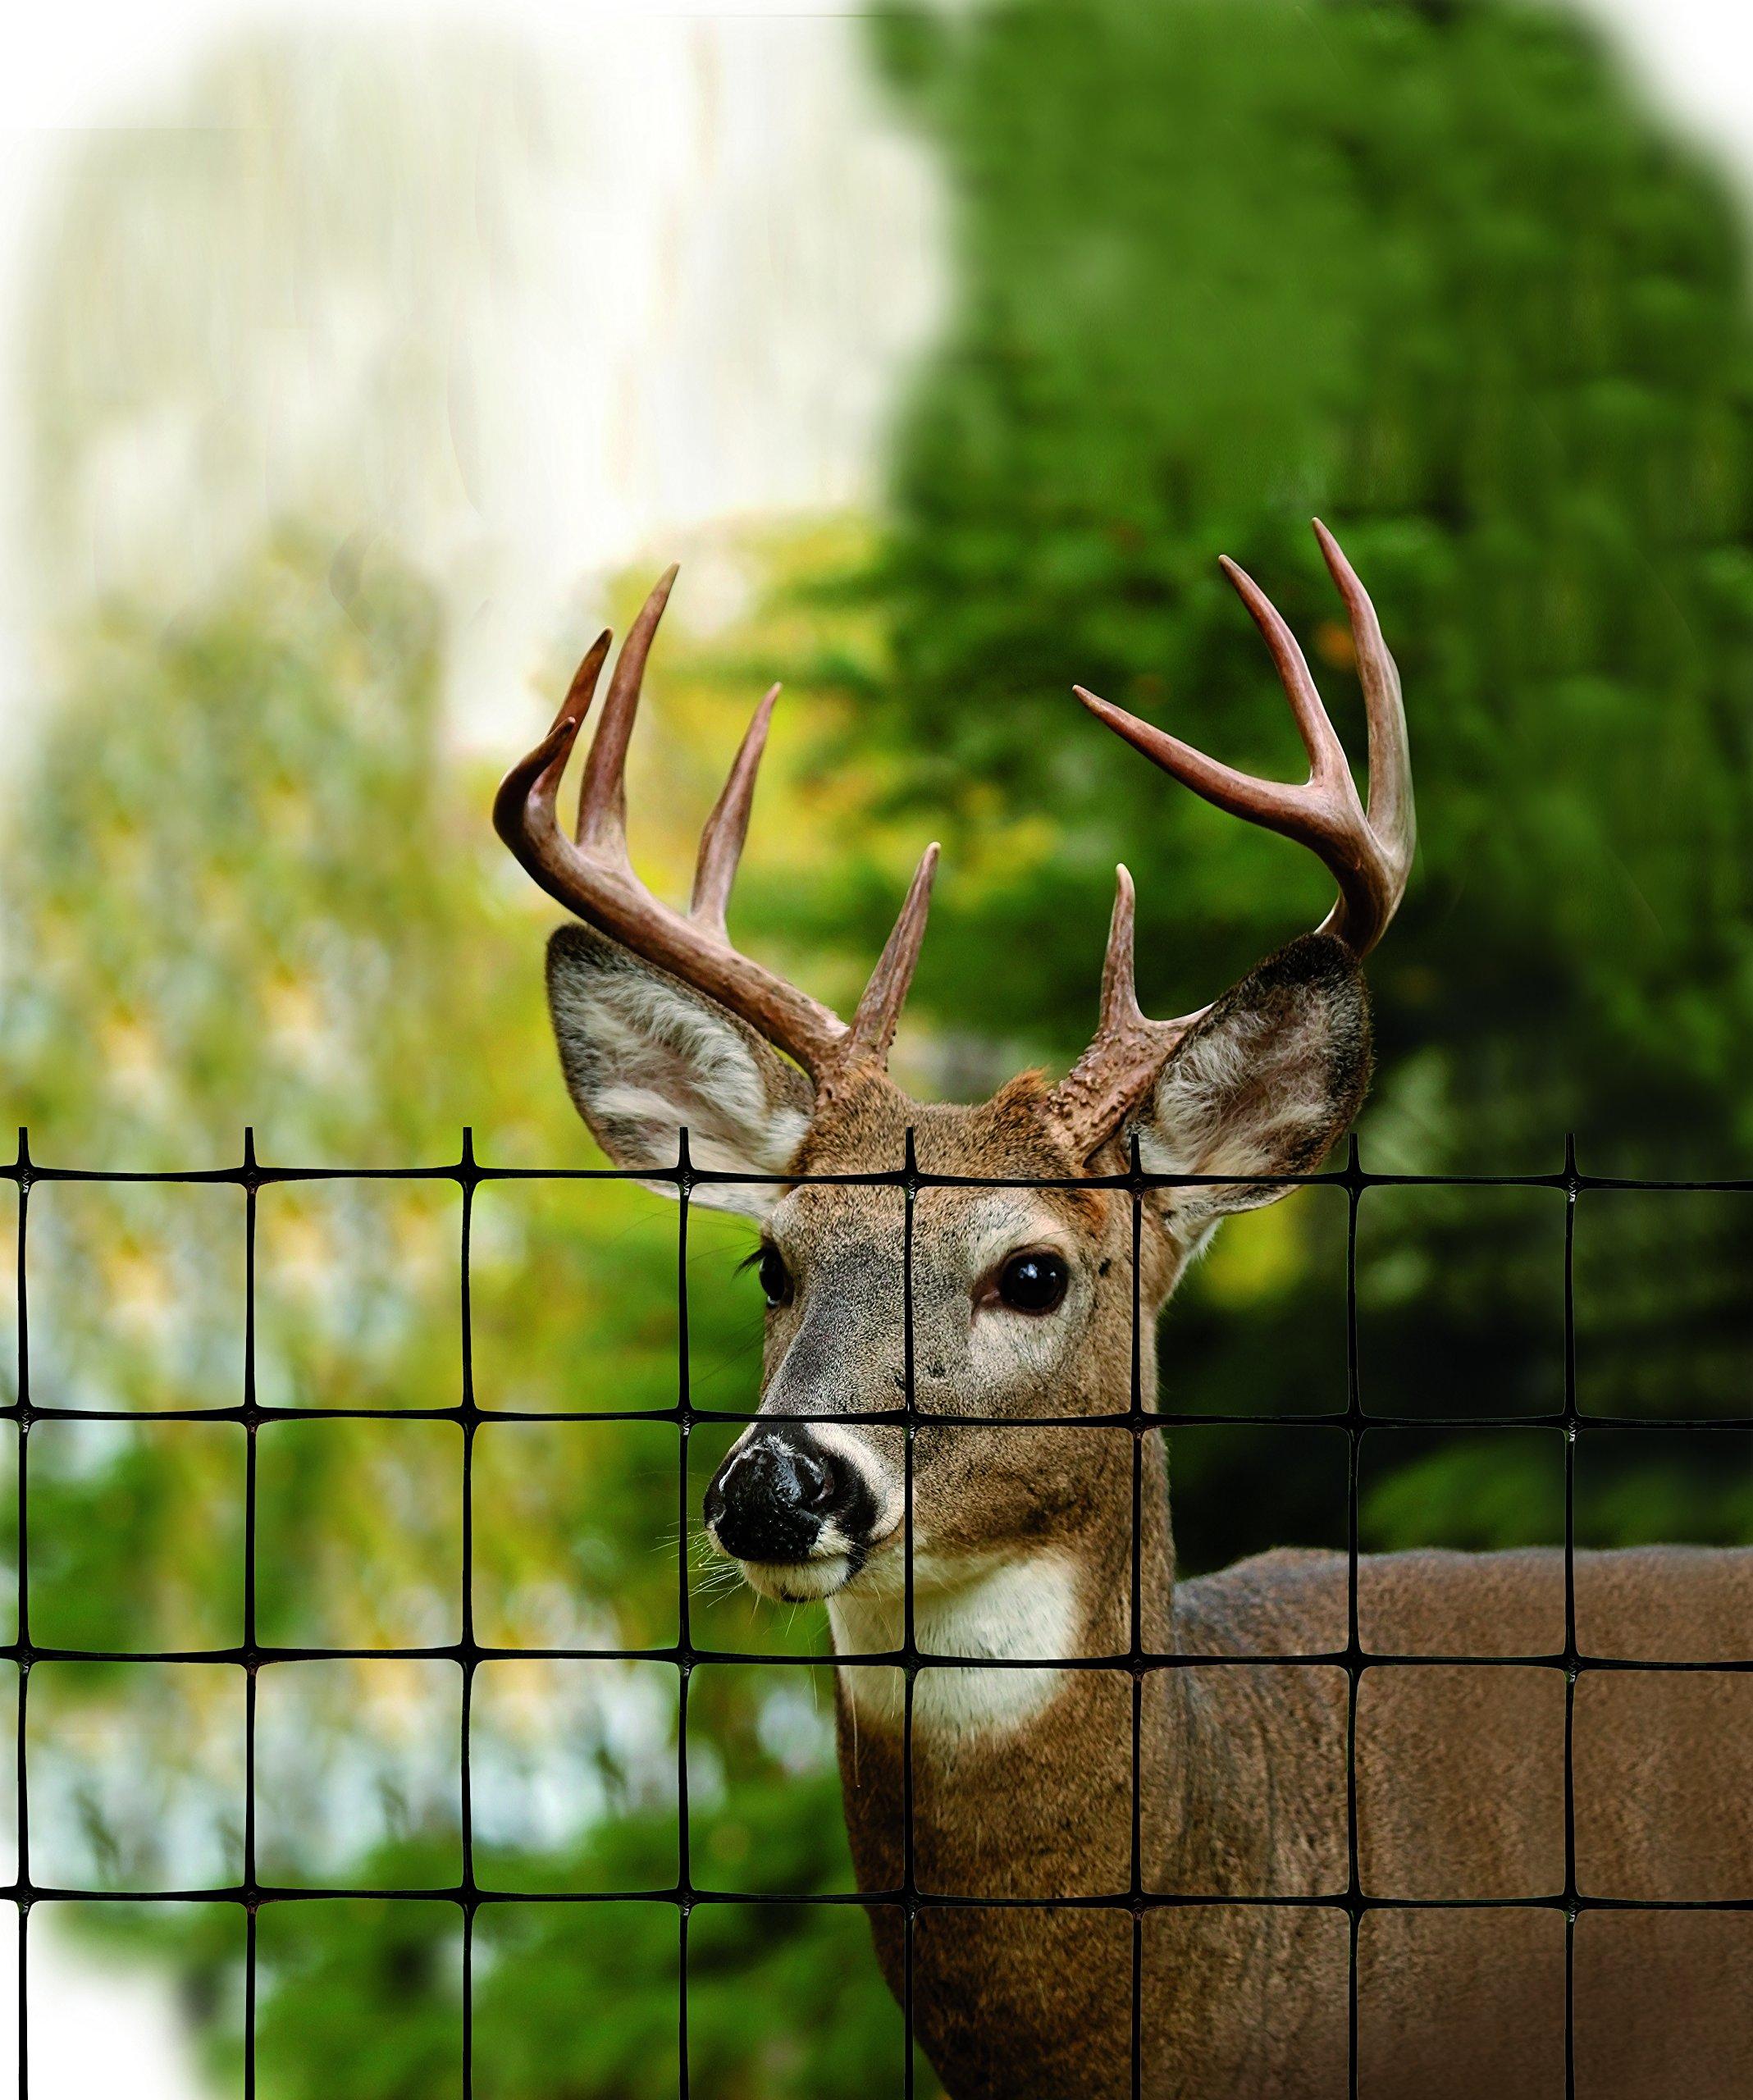 Tenax 2A120379 Deer Fence Economy Control, 7.5' x 165', Black by Tenax